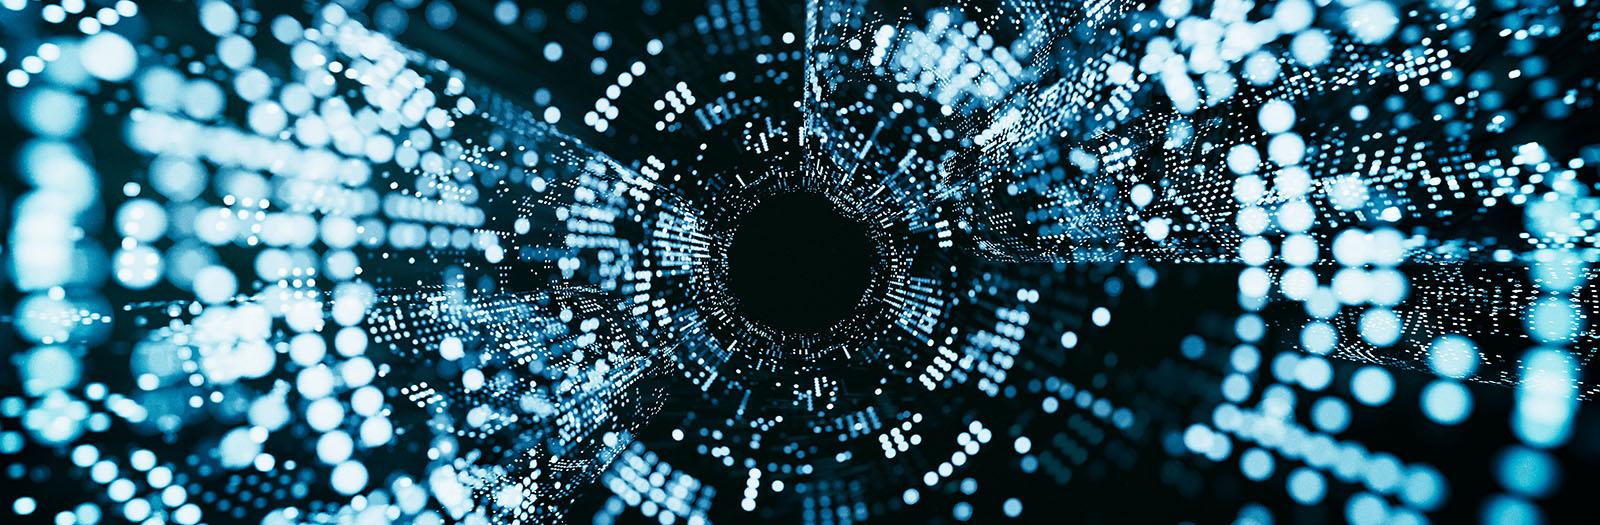 abstract image of big data